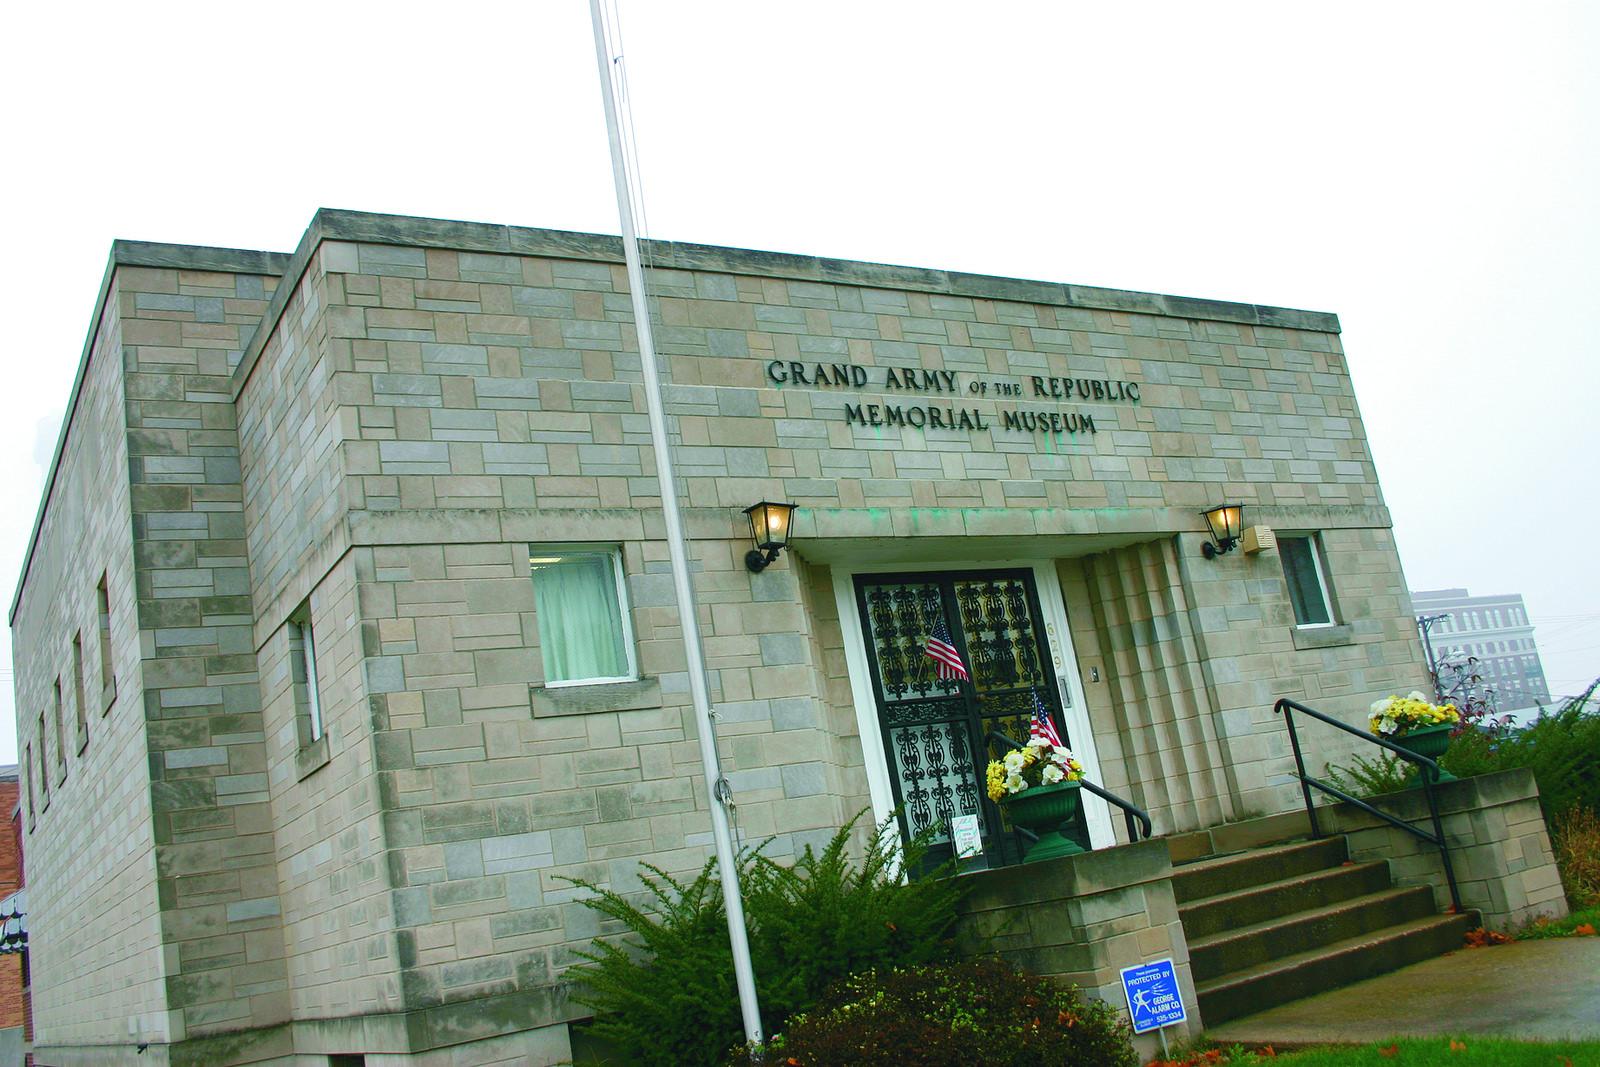 Grand Army of the Republic Memorial Museum